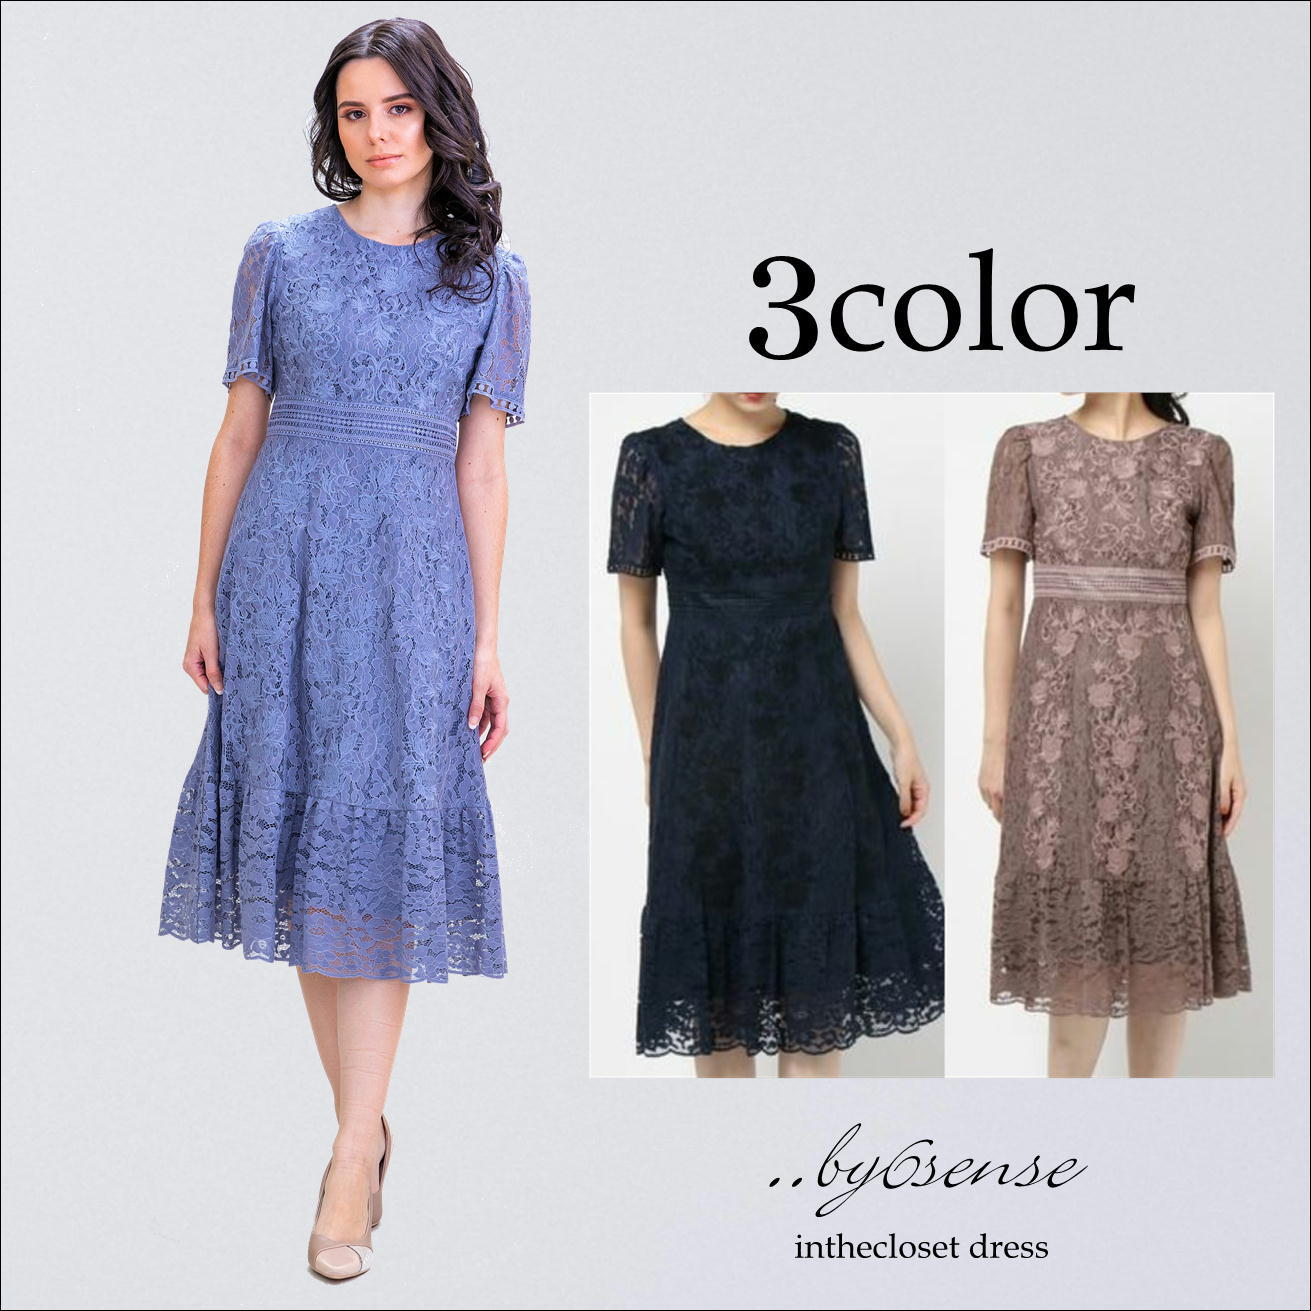 3color マーメイドスカート9151 結婚式・セレモニー・パーティードレス ..by6senseドレス